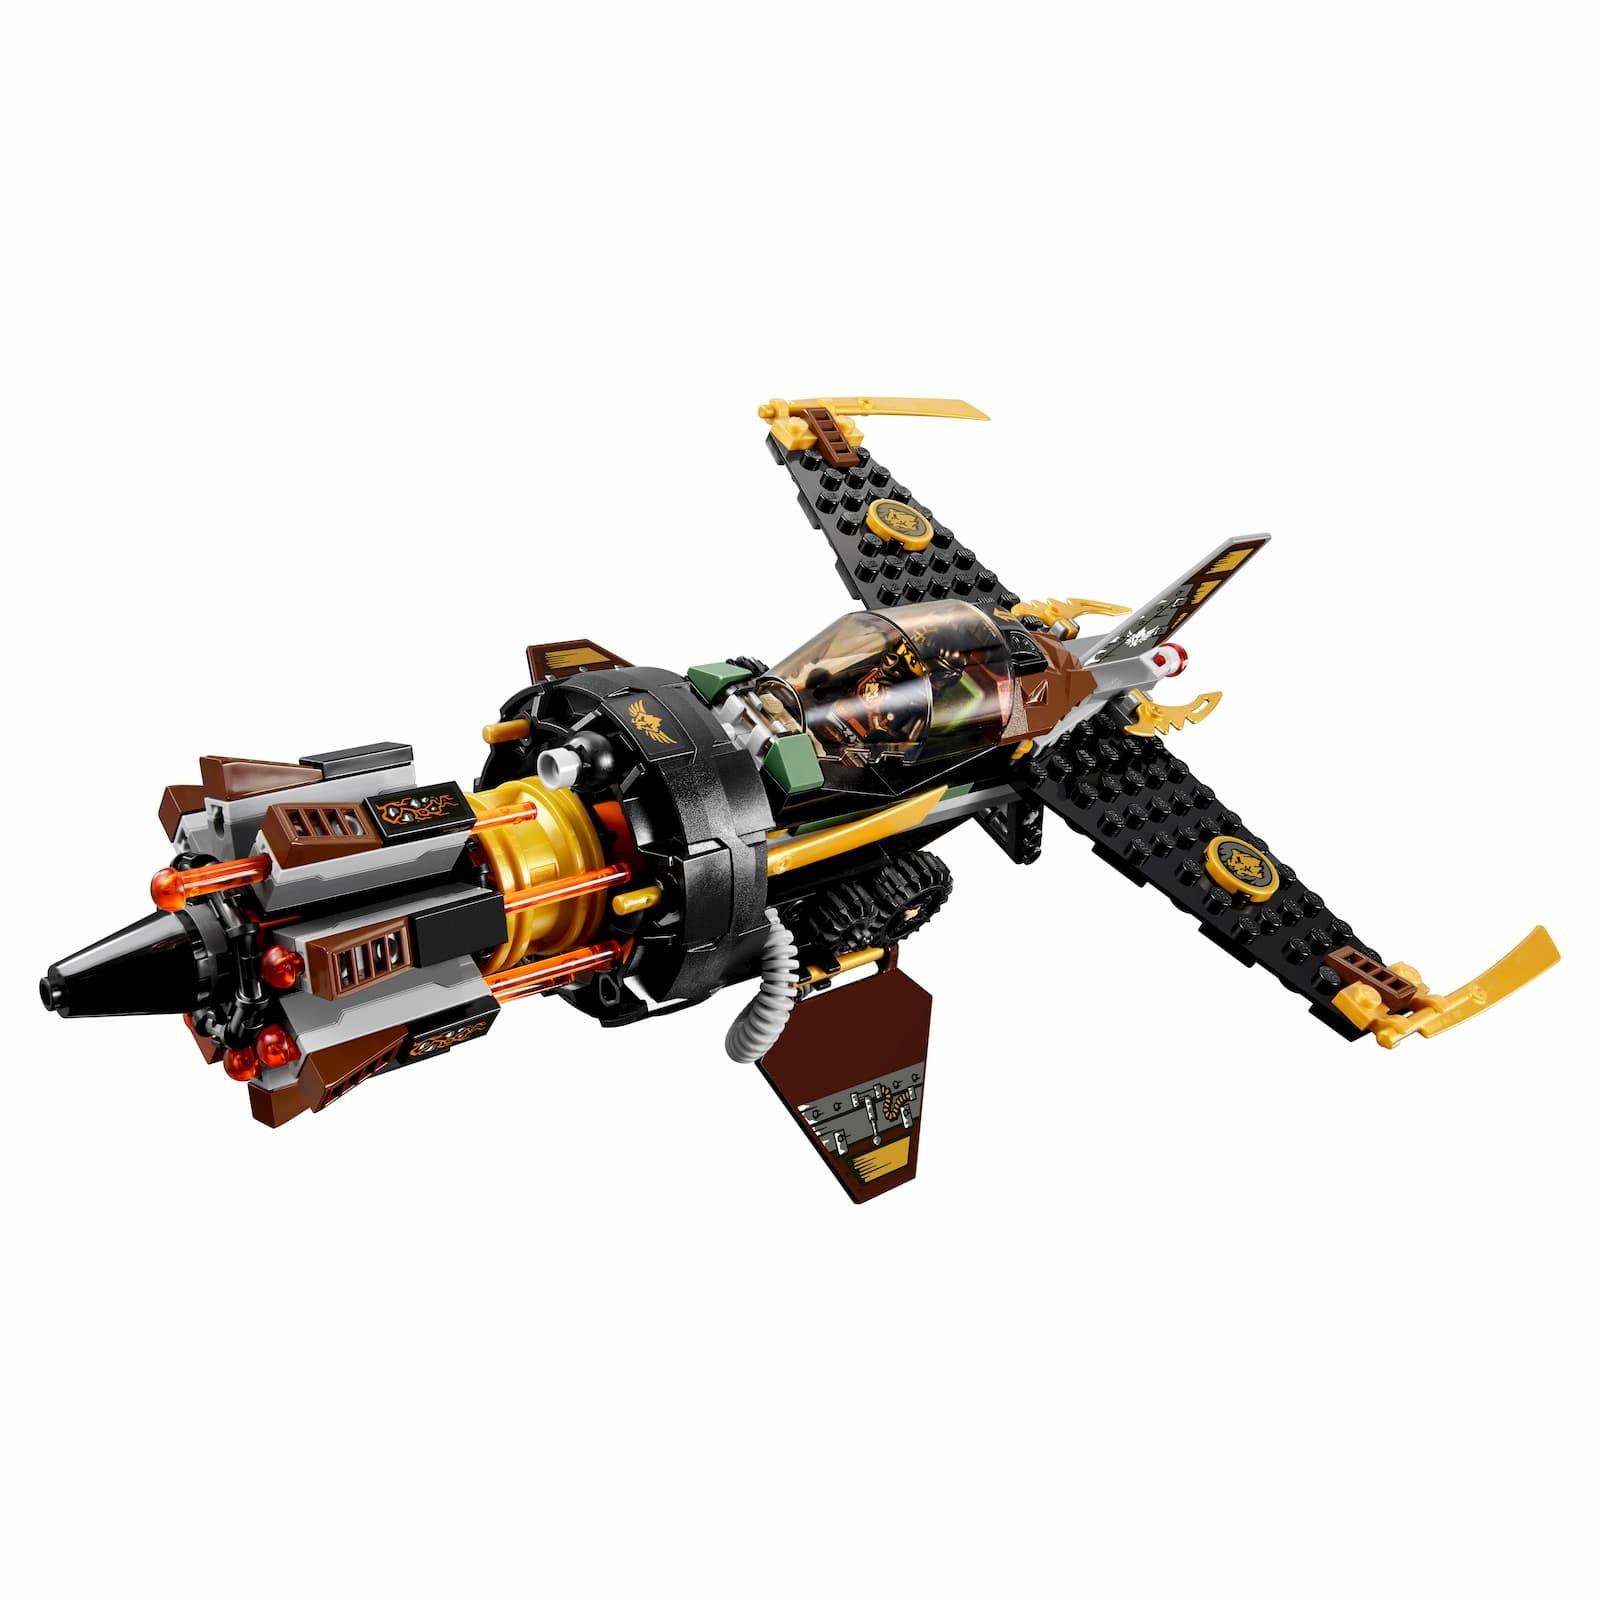 Конструктор Bl «Истребитель Коула» 10322 (НиндзяГо 70747), 234 детали